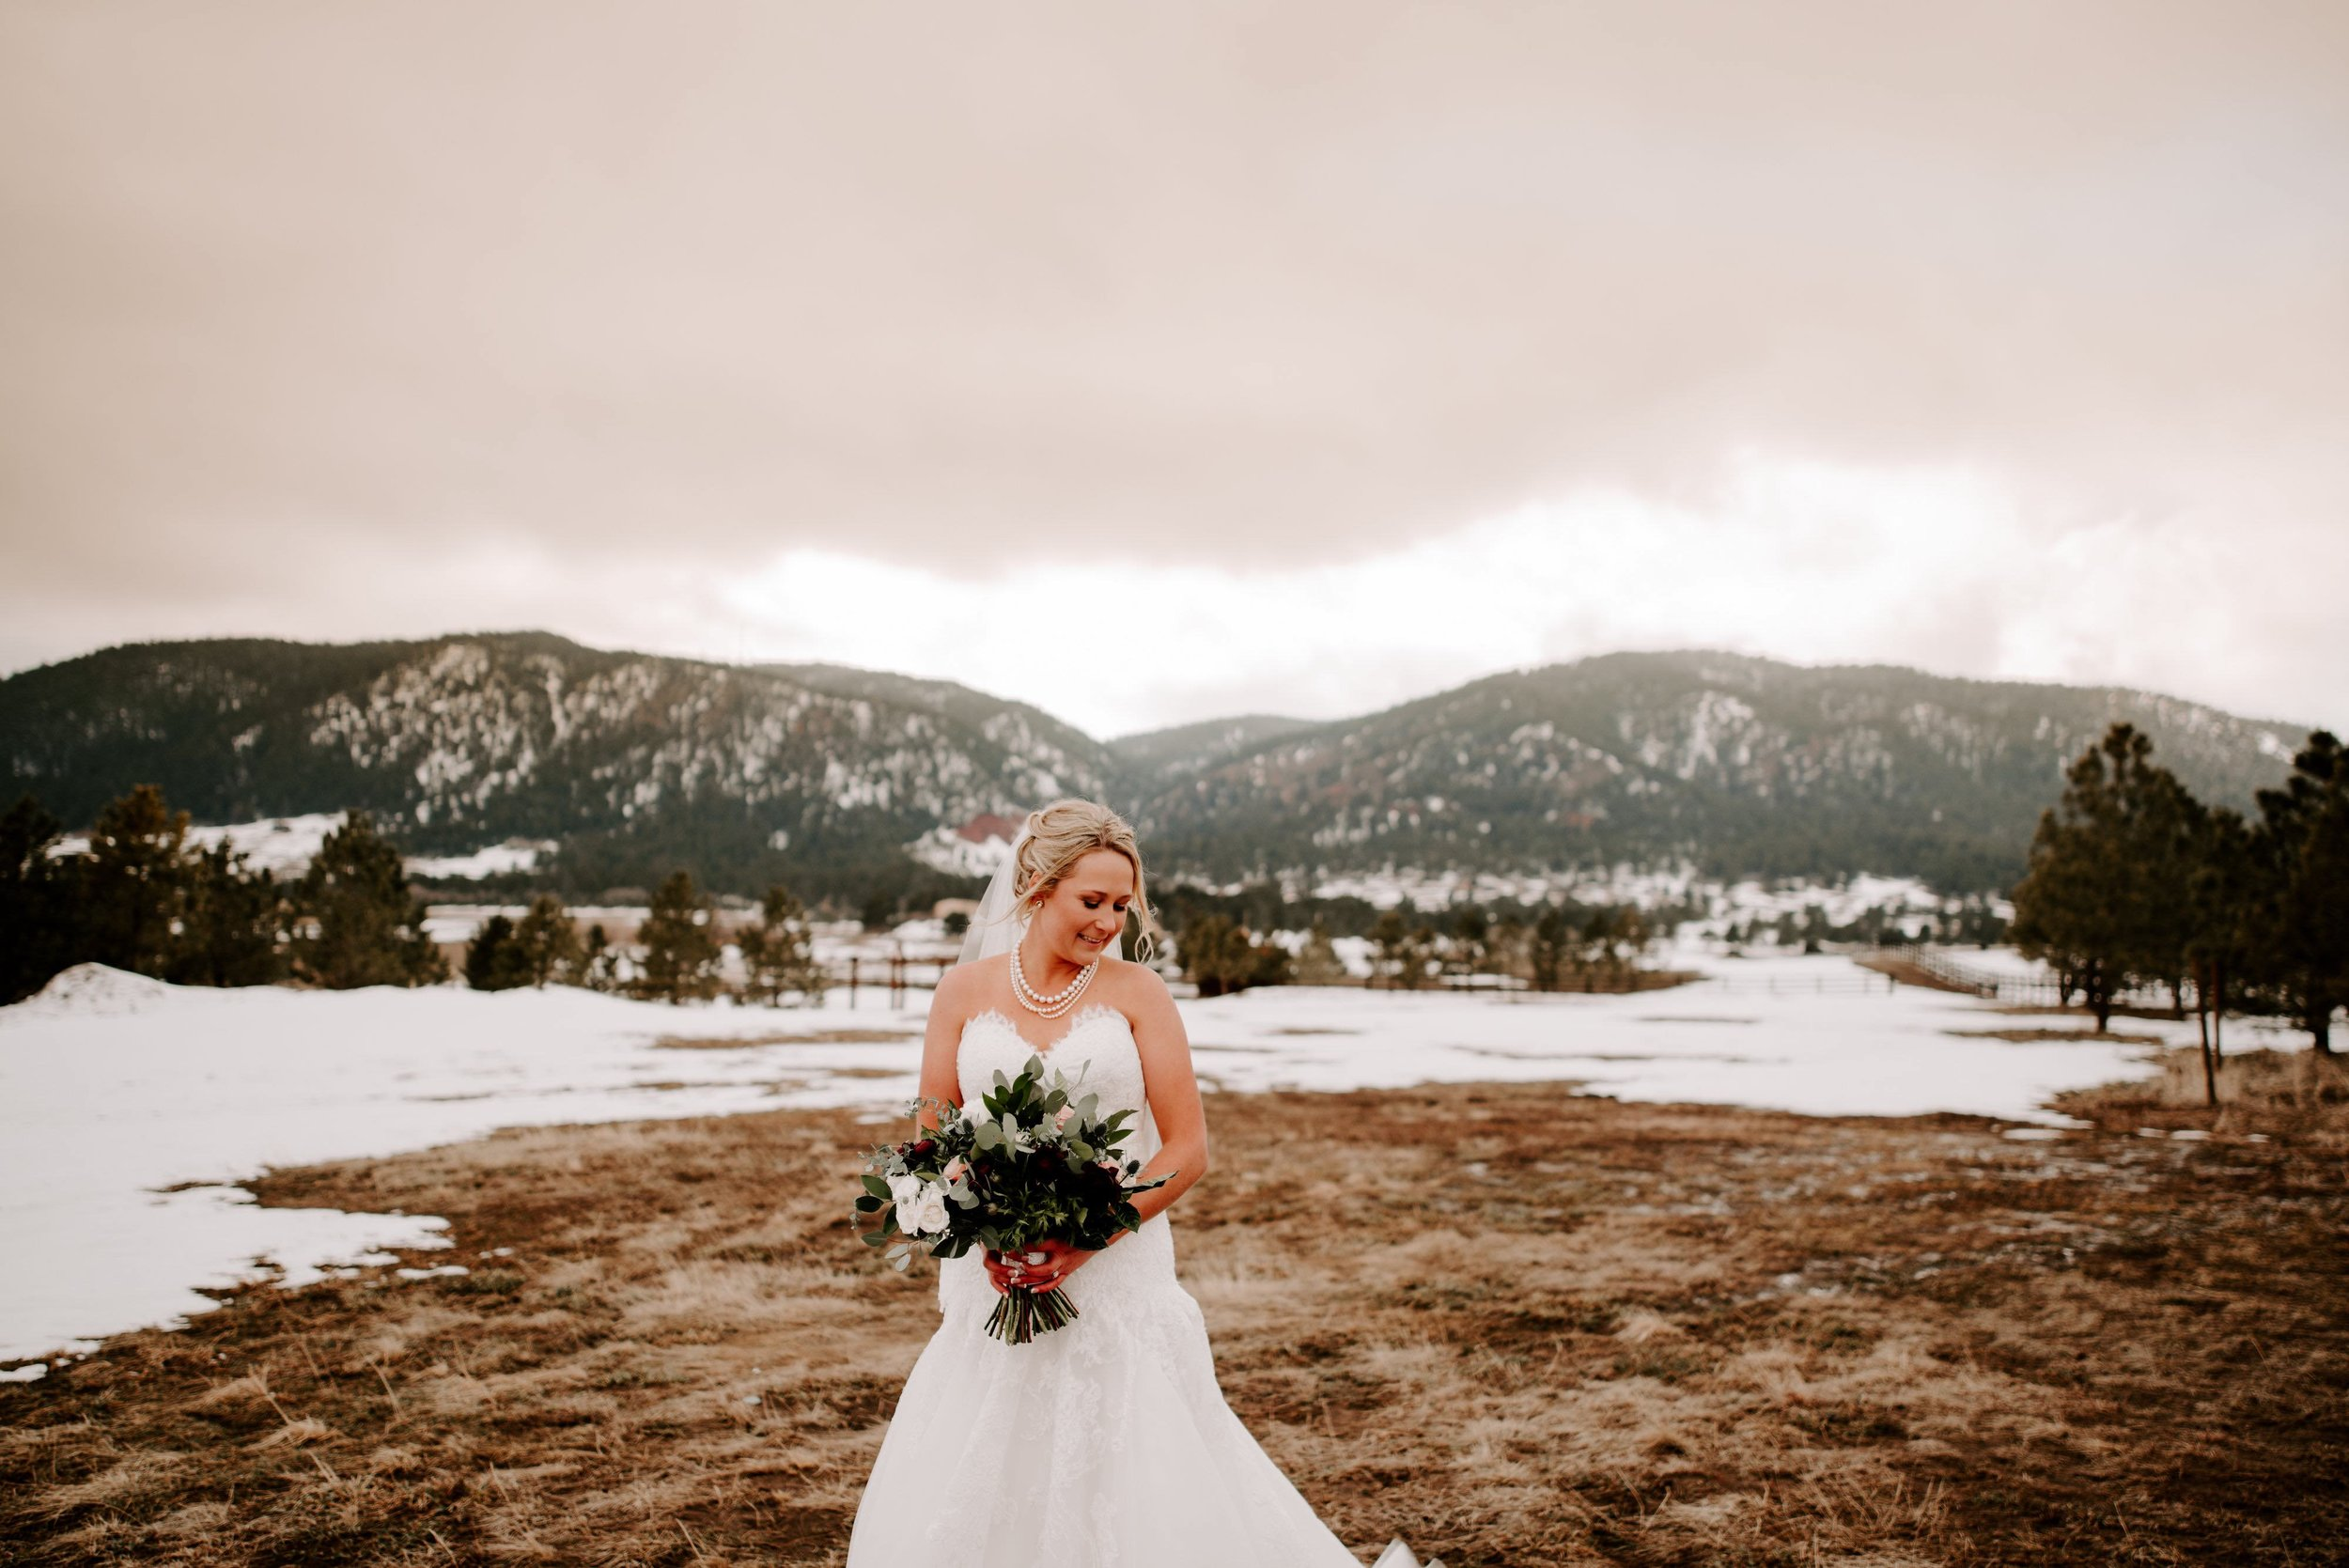 Kisa Conrad Favorites-0045spruce-mountain-ranch-larkspur-colorado-engagement-photography.jpeg